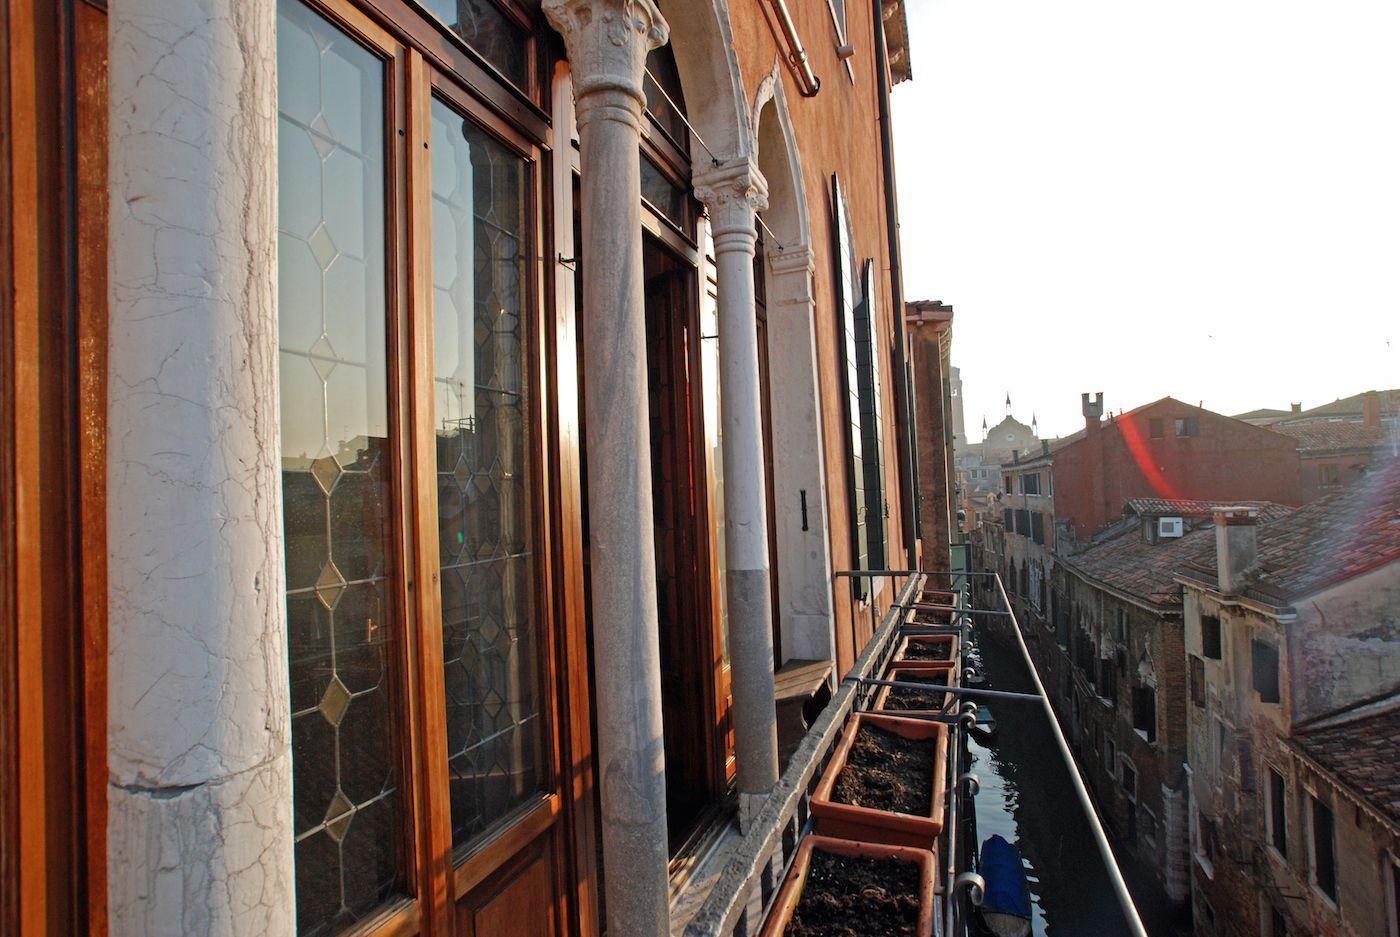 sunset on the balcony